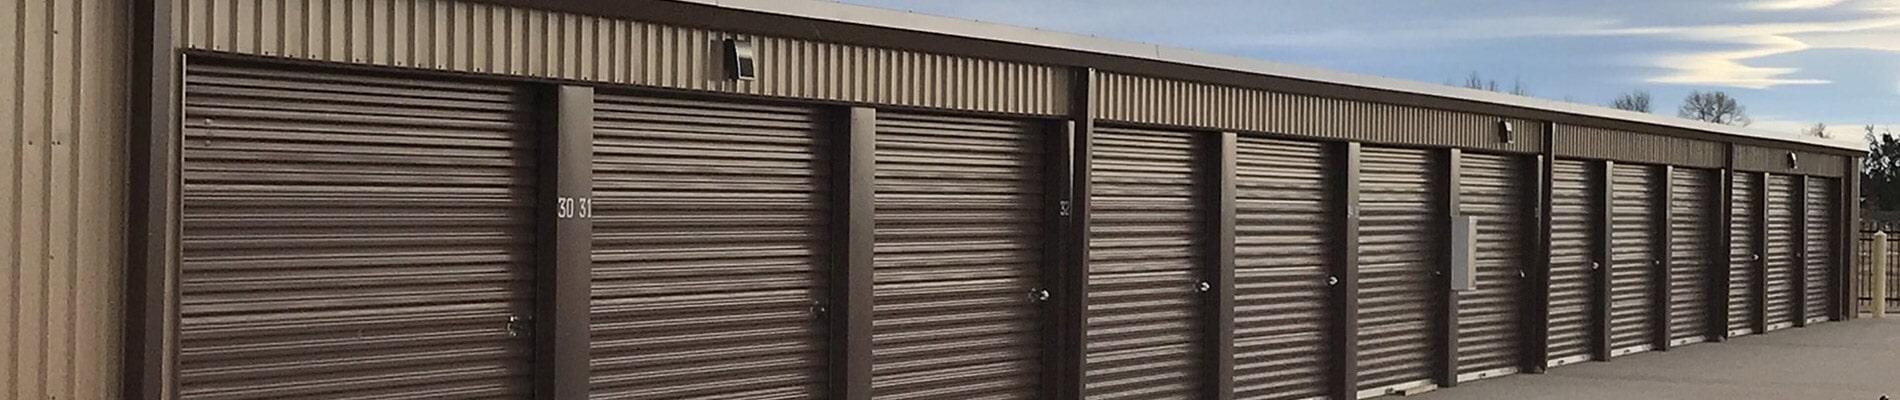 & Mini storage   Laramie WY   Antelope Meadows Mini Storage